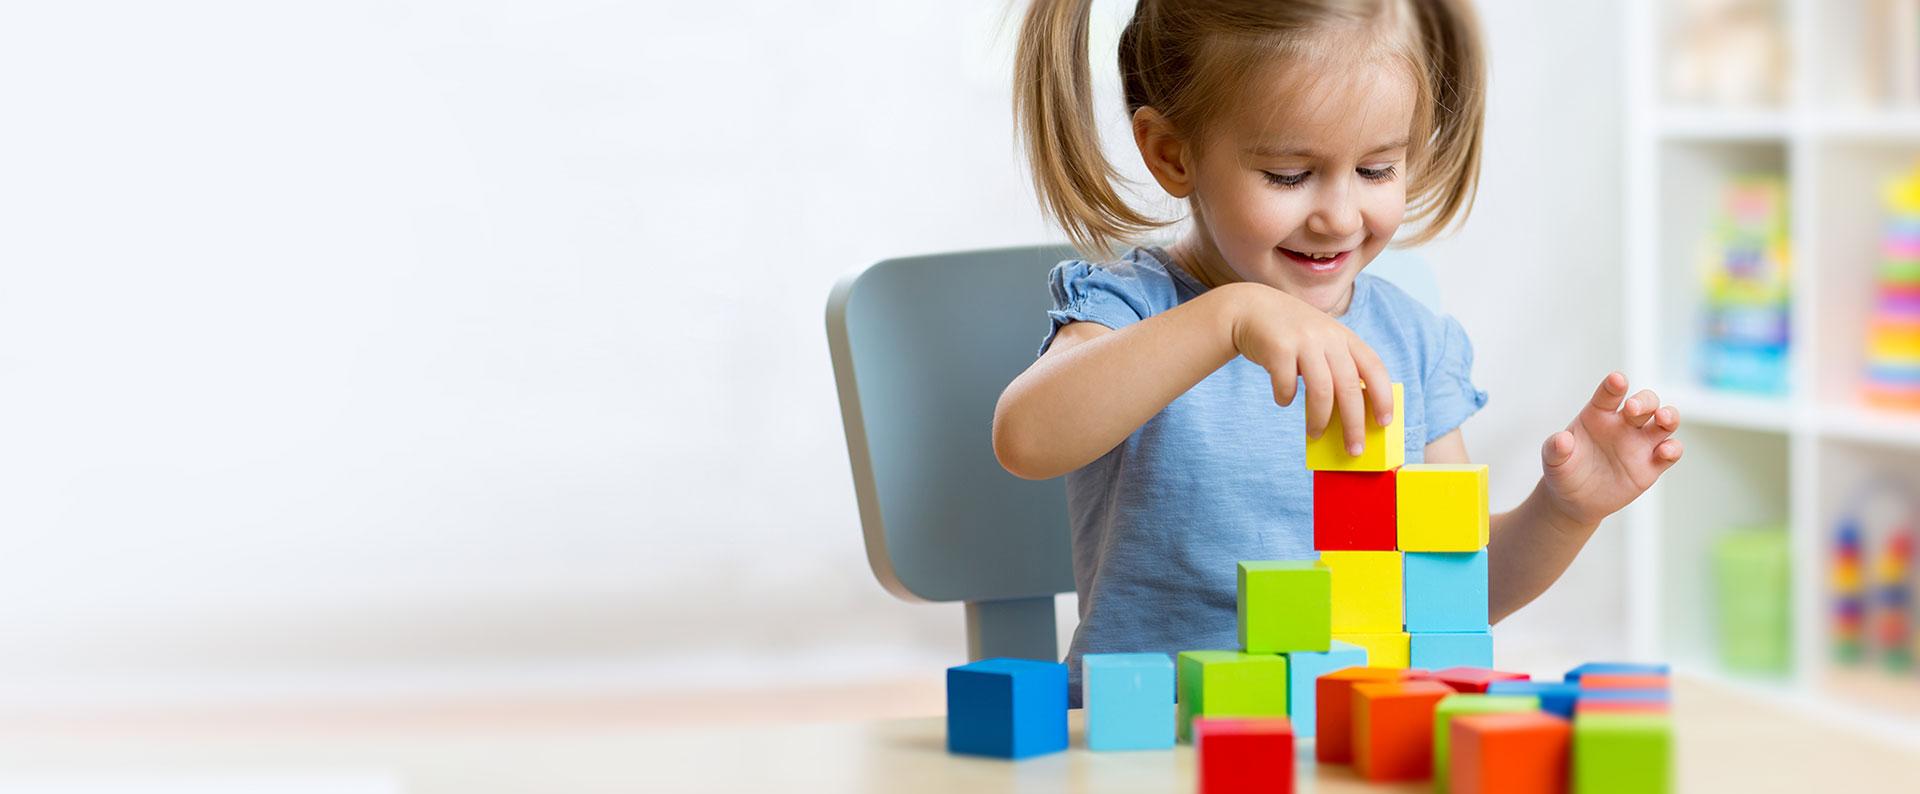 why choose montessori preschool montessori children s house godfrey give your child the 121